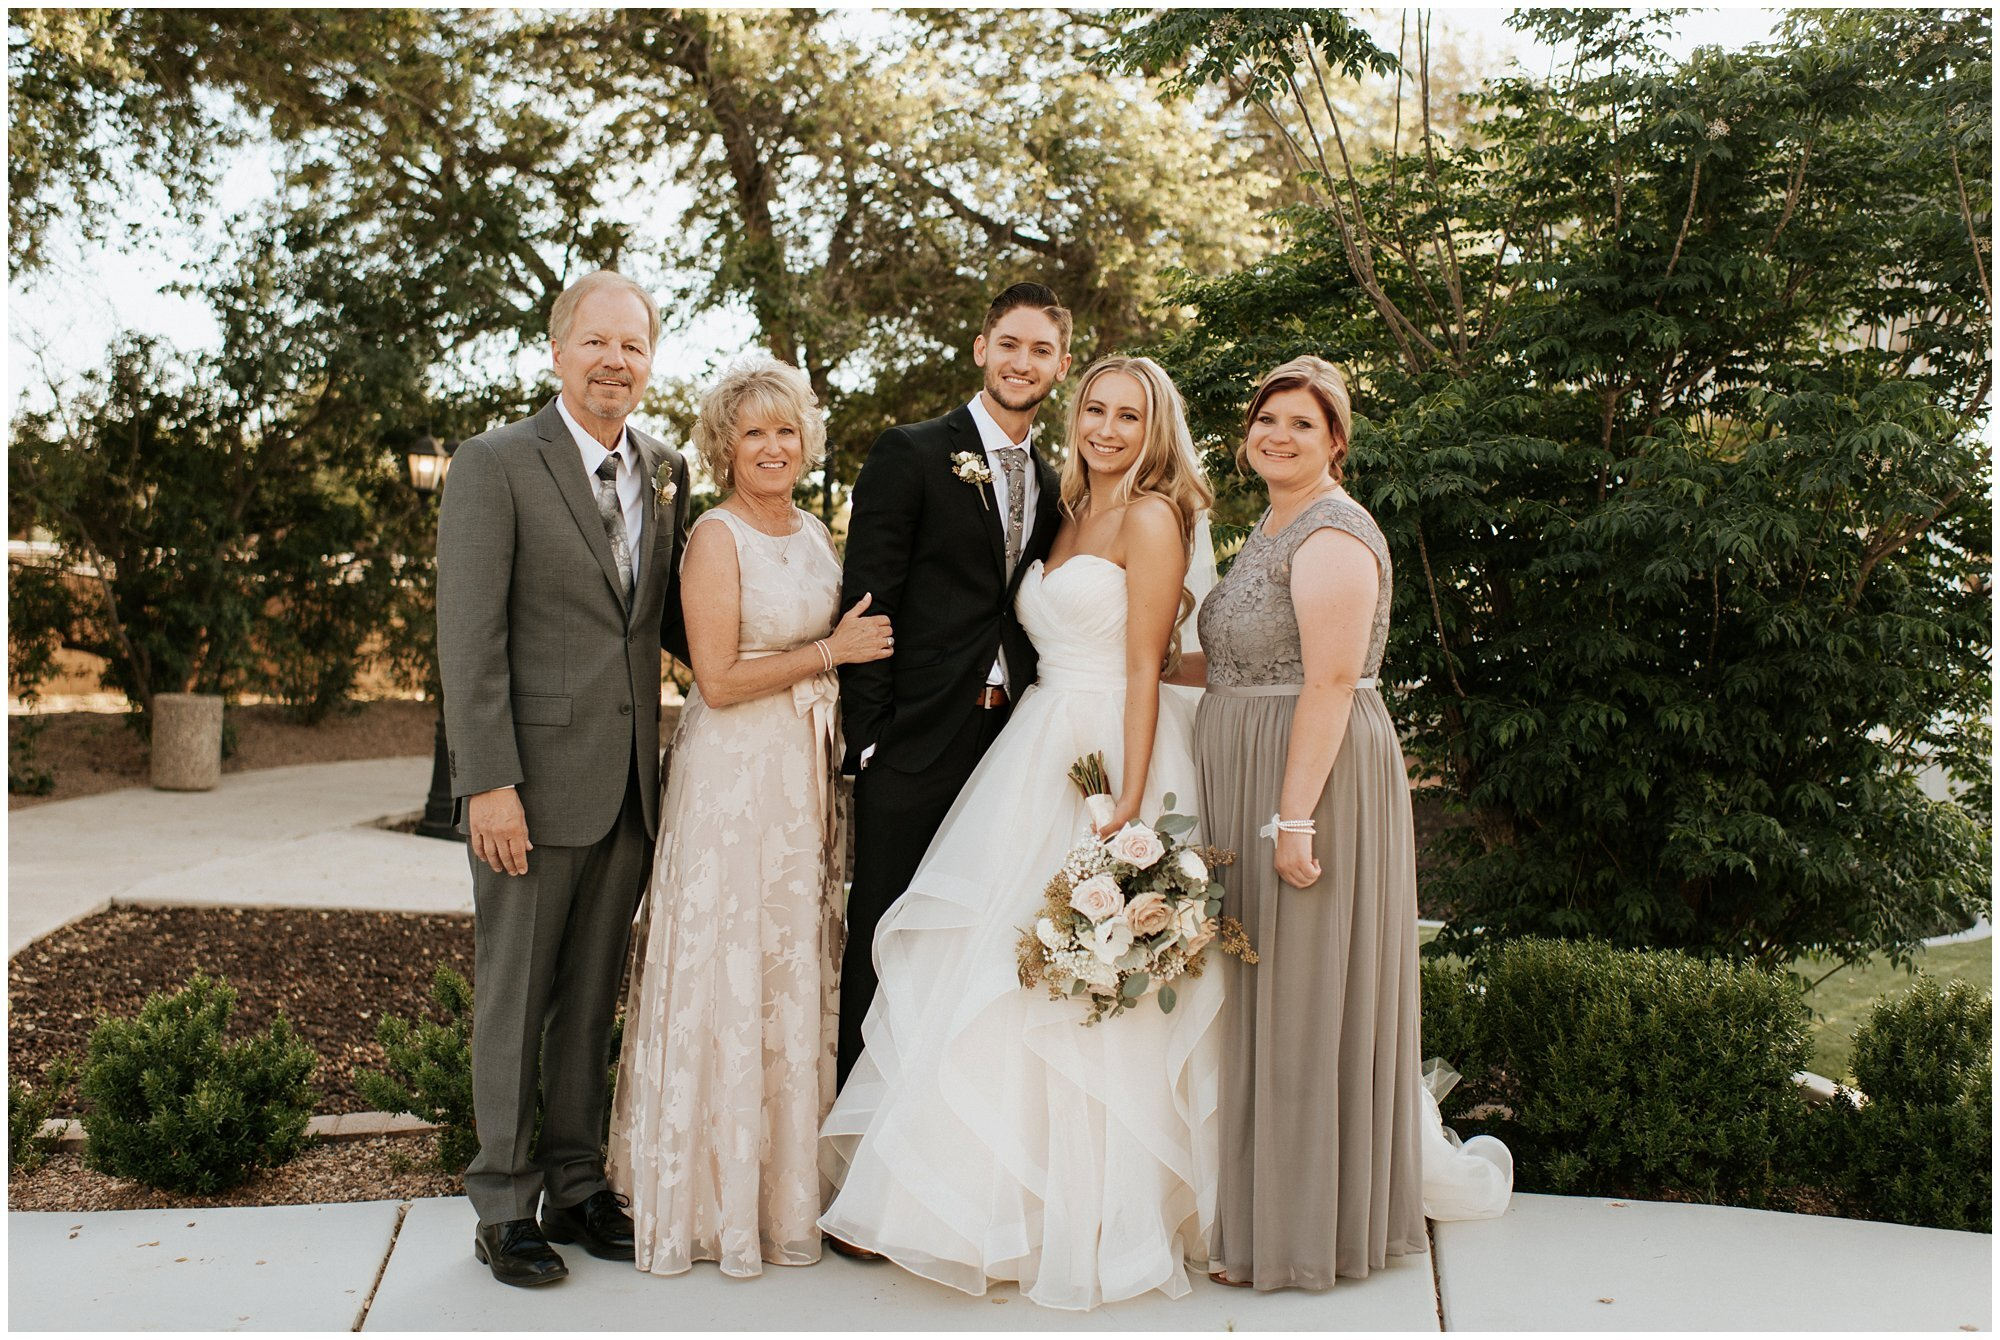 Wedgewood_Lindsay_Groves-Arizona-Wedding-Photographer-M+C_0041.jpg